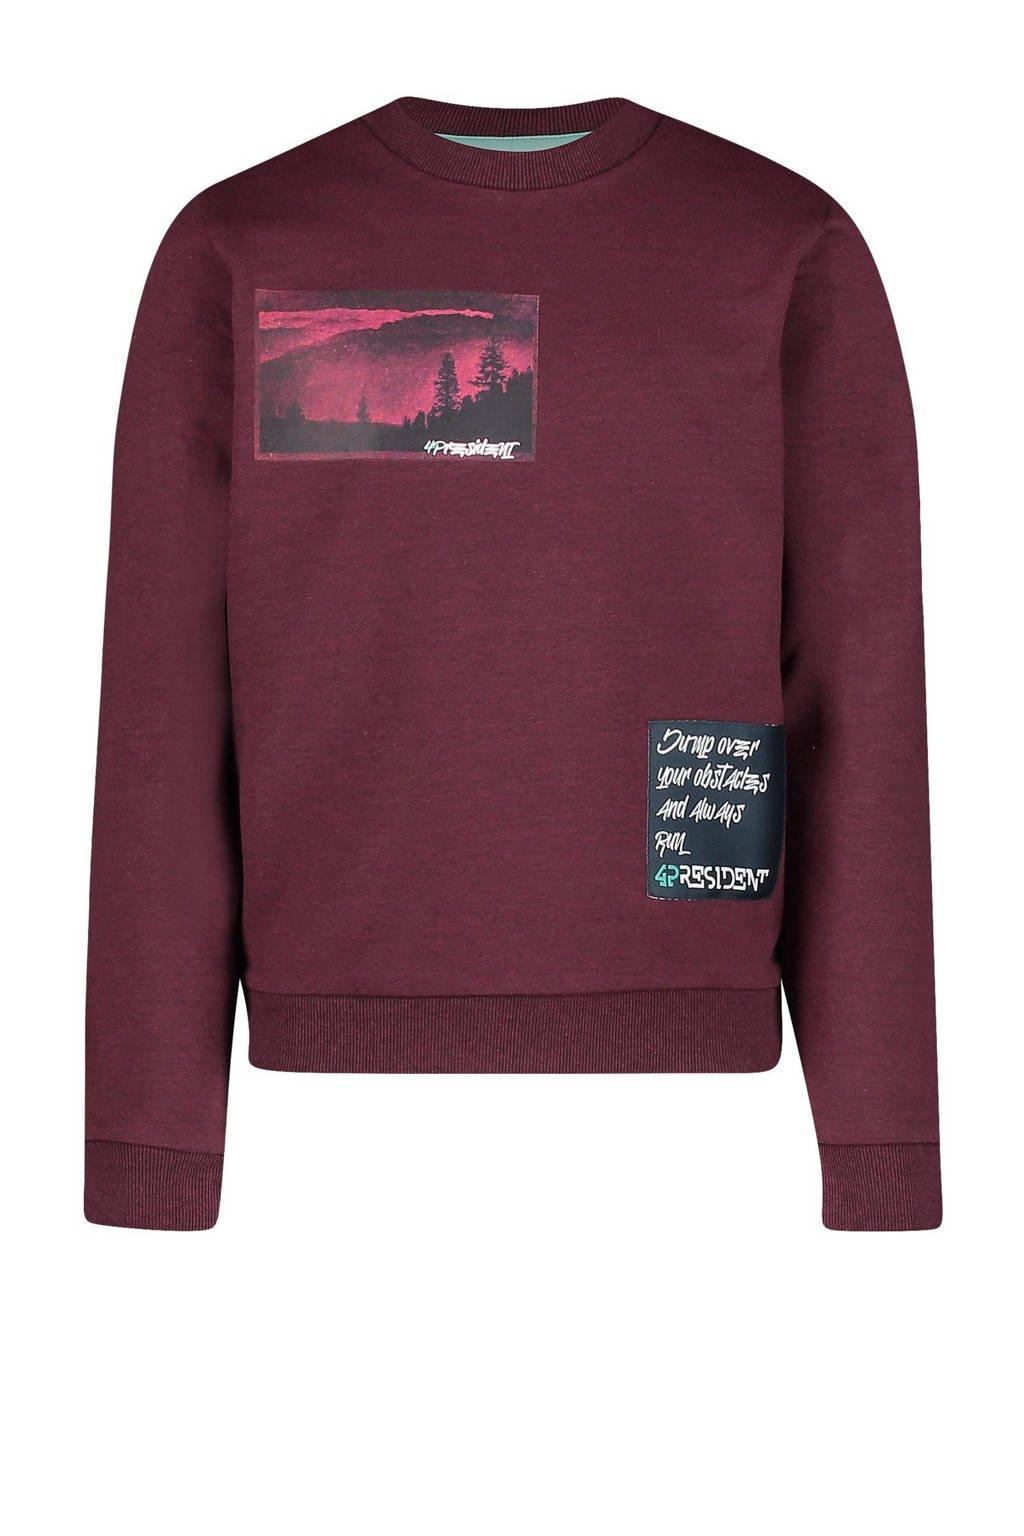 4PRESIDENT sweater Owen met printopdruk bordeaux, Bordeaux